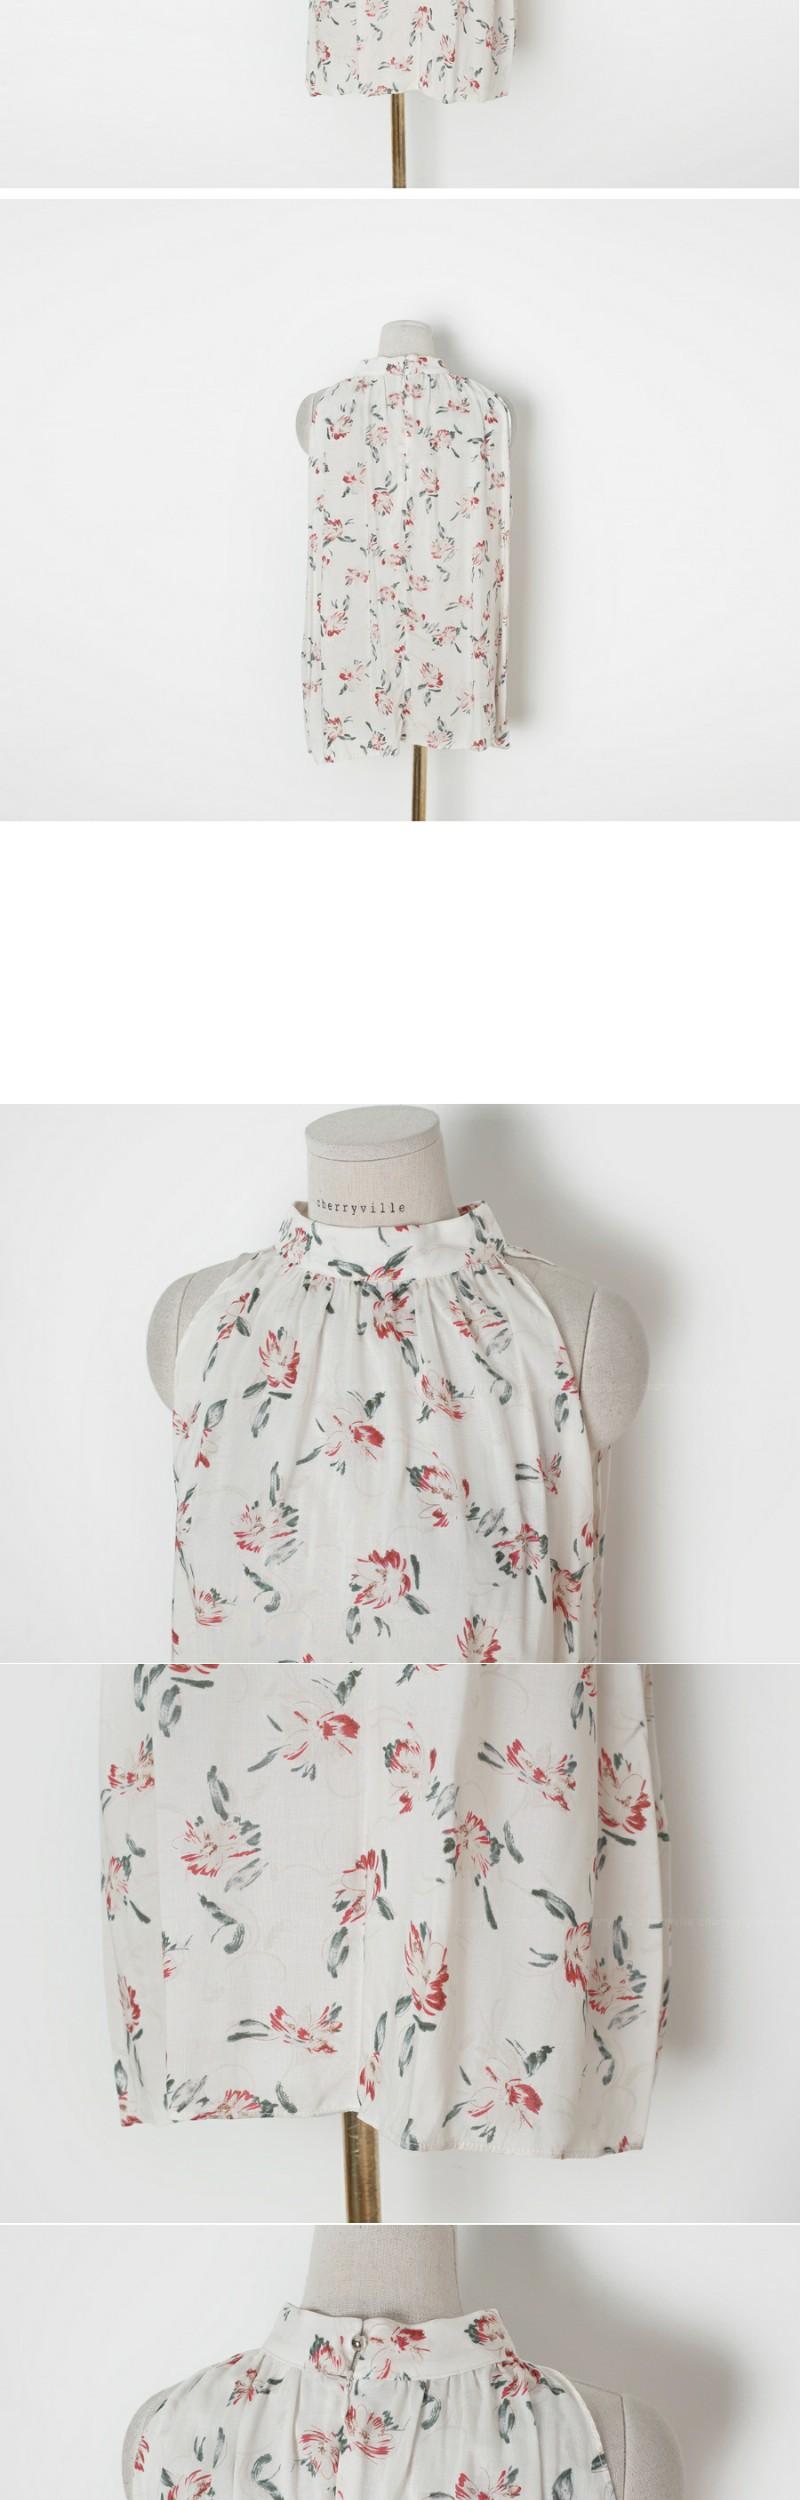 Flower holter blouse